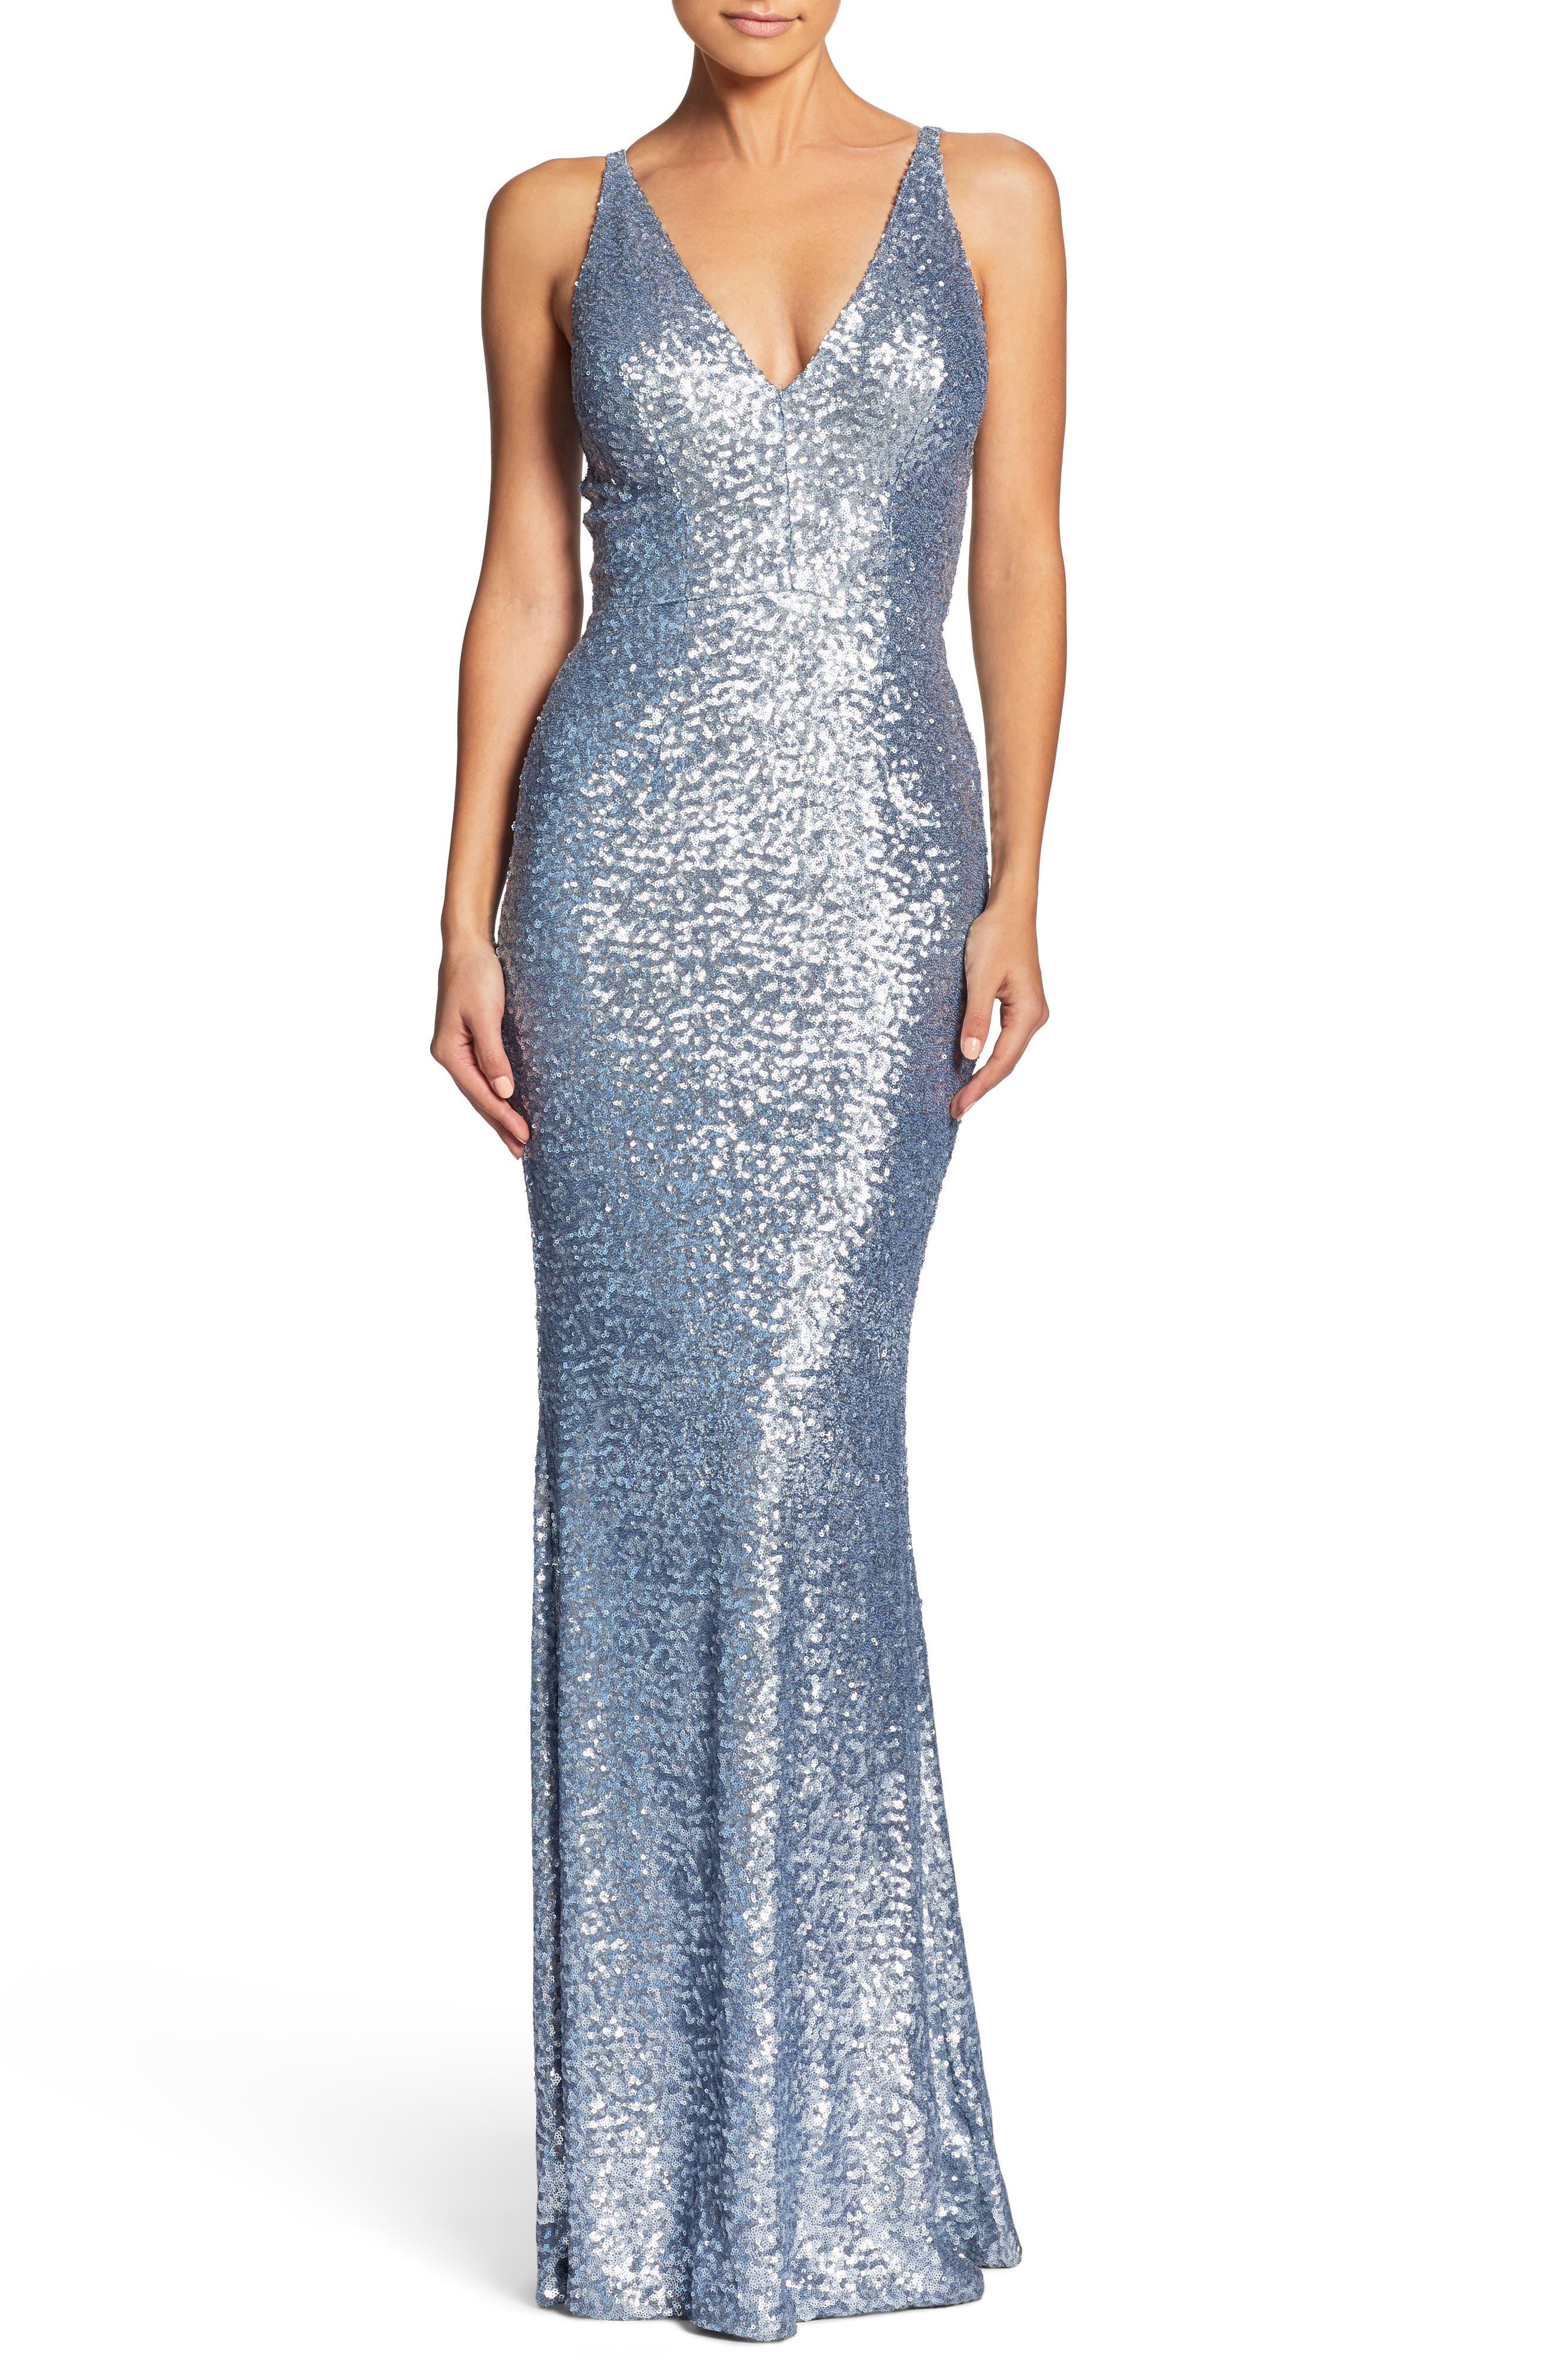 Alternate Image 1 Selected - Dress the Population Harper Mermaid Gown